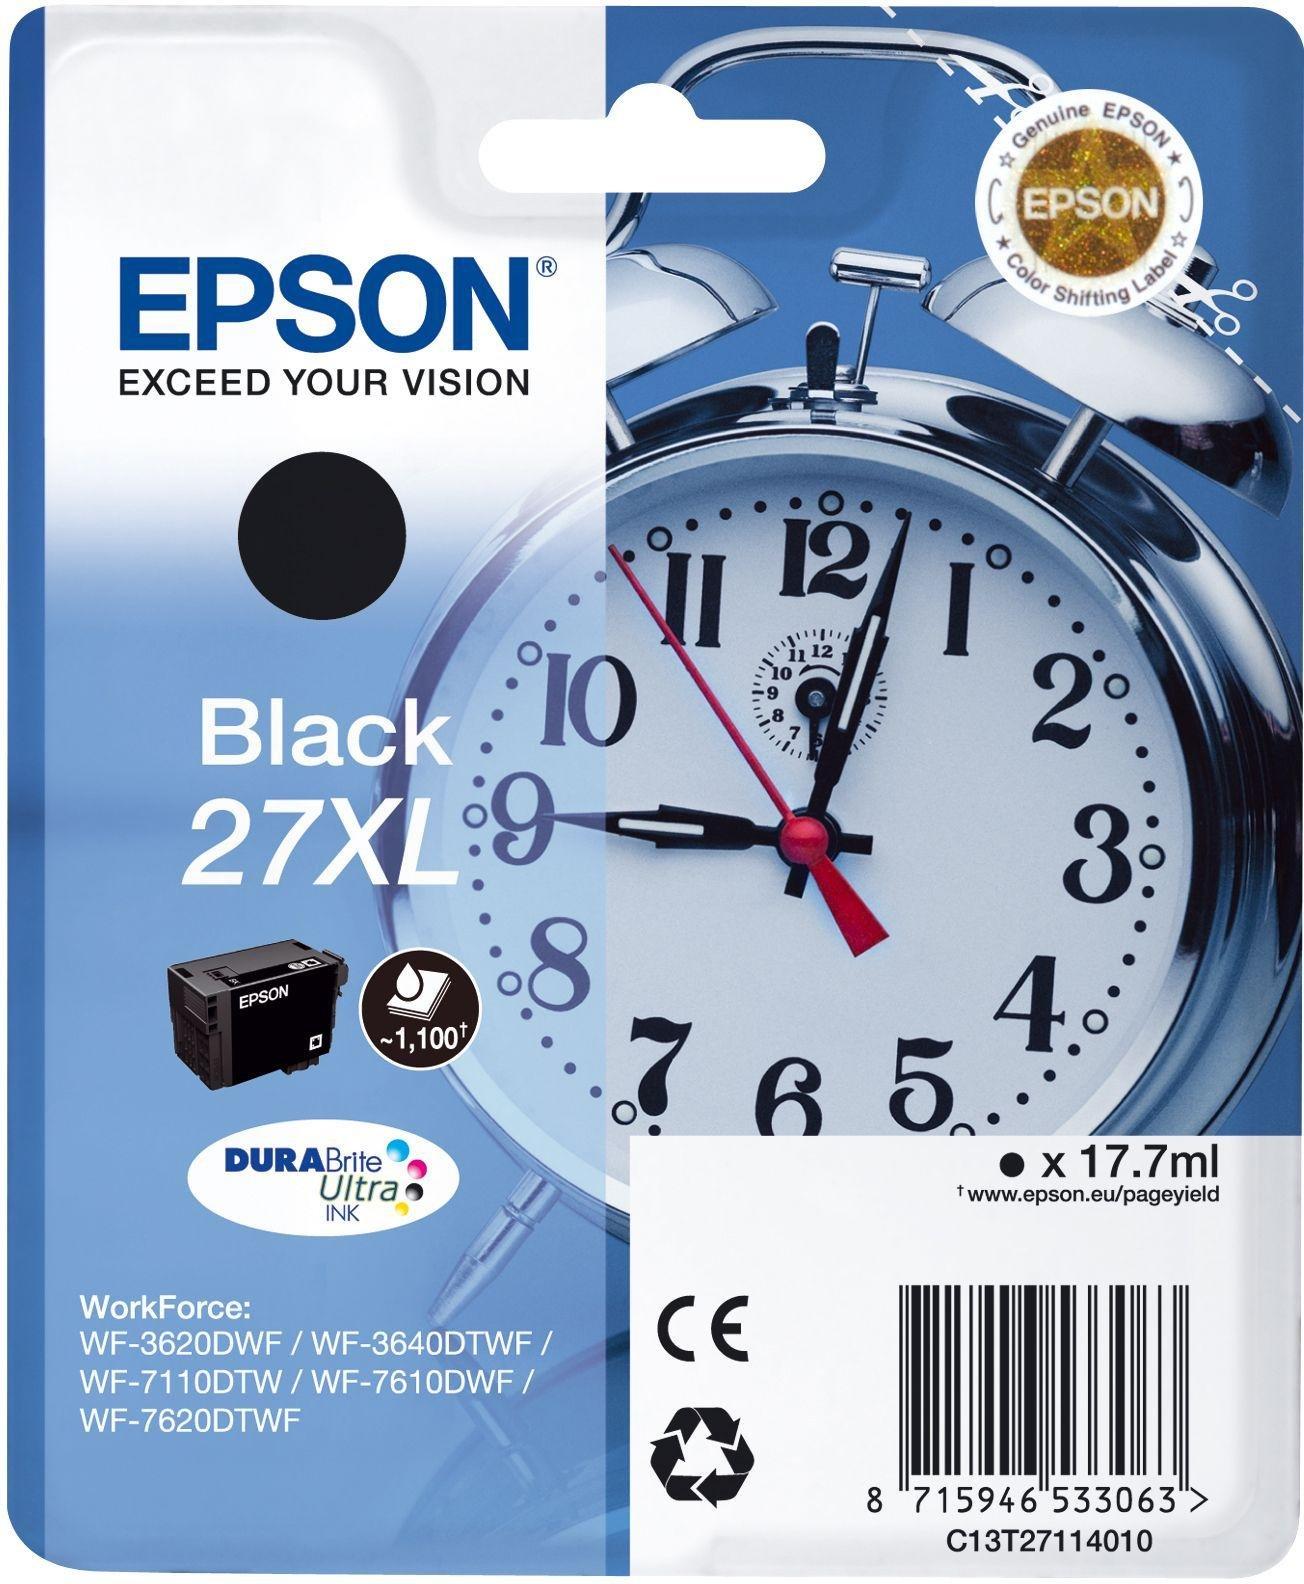 Image of Epson Alarm Clock 27 XL Black Ink Cartridge